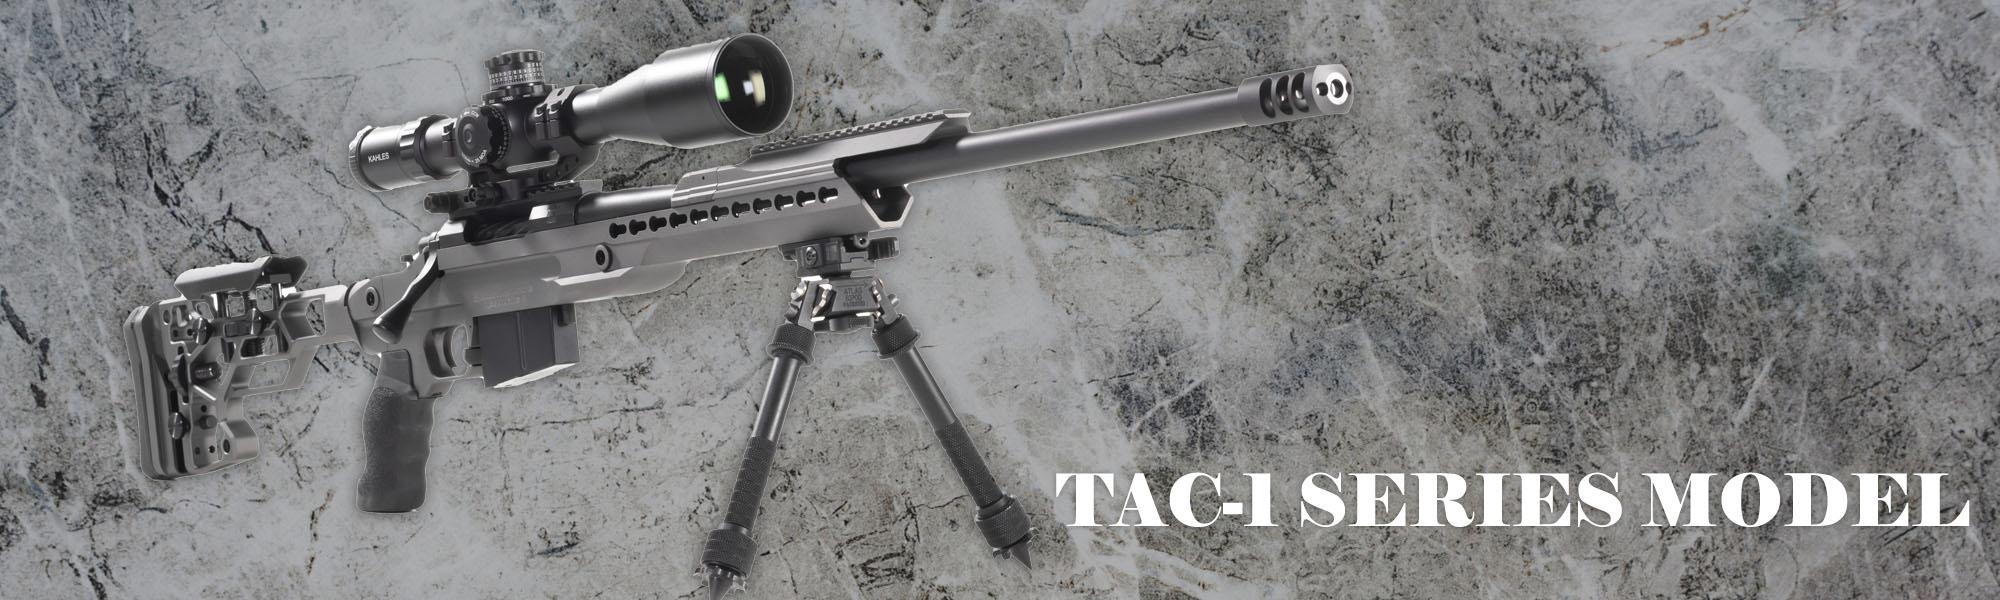 TAC-1 Titanium Models Starting From $4,449 00 | H&H